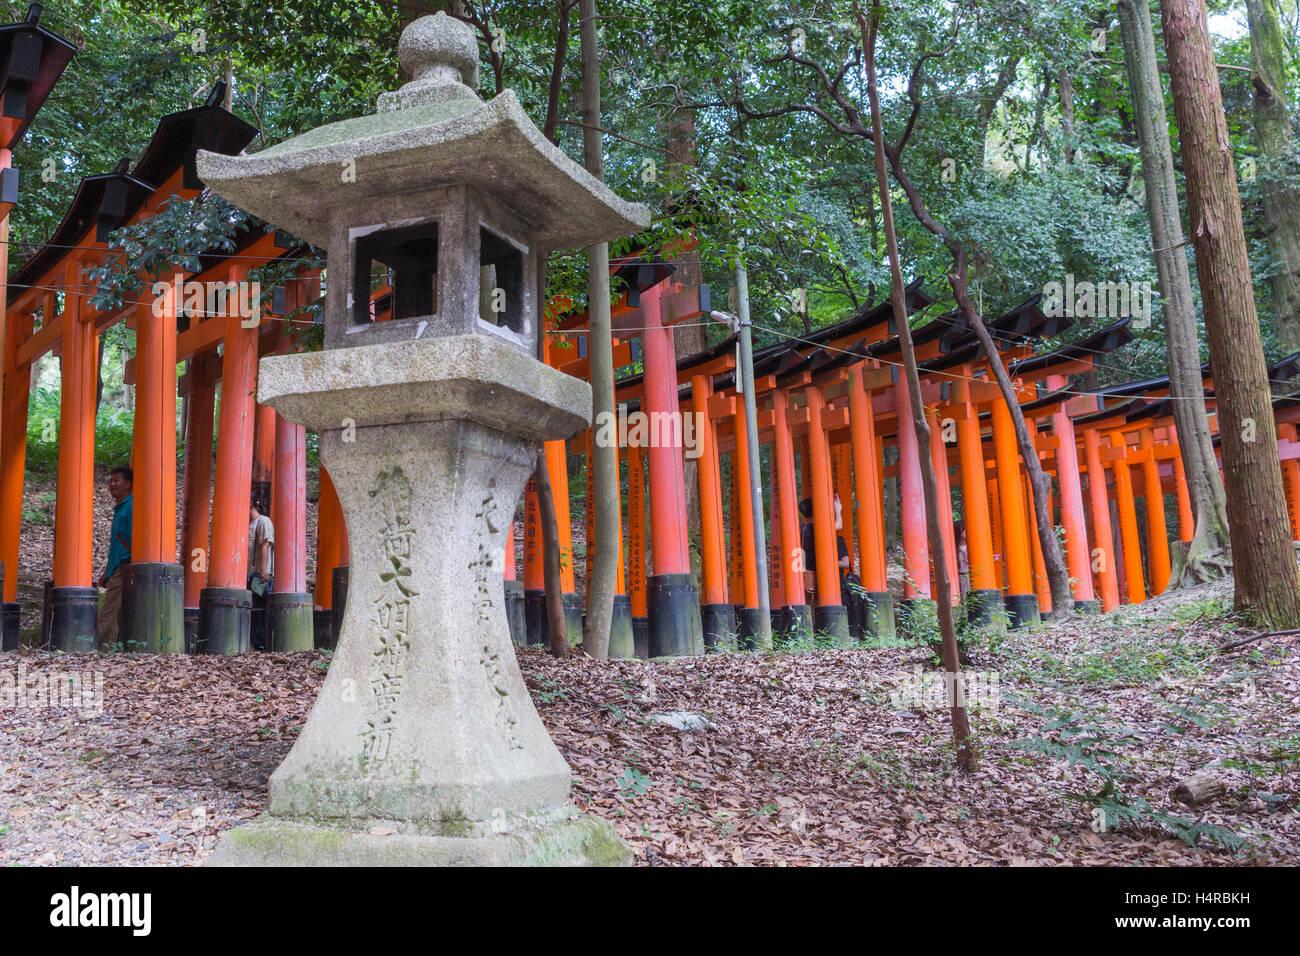 Thousands of Torii create path at Fushimi Inari Taisha Shinto Shrine. - Stock Image